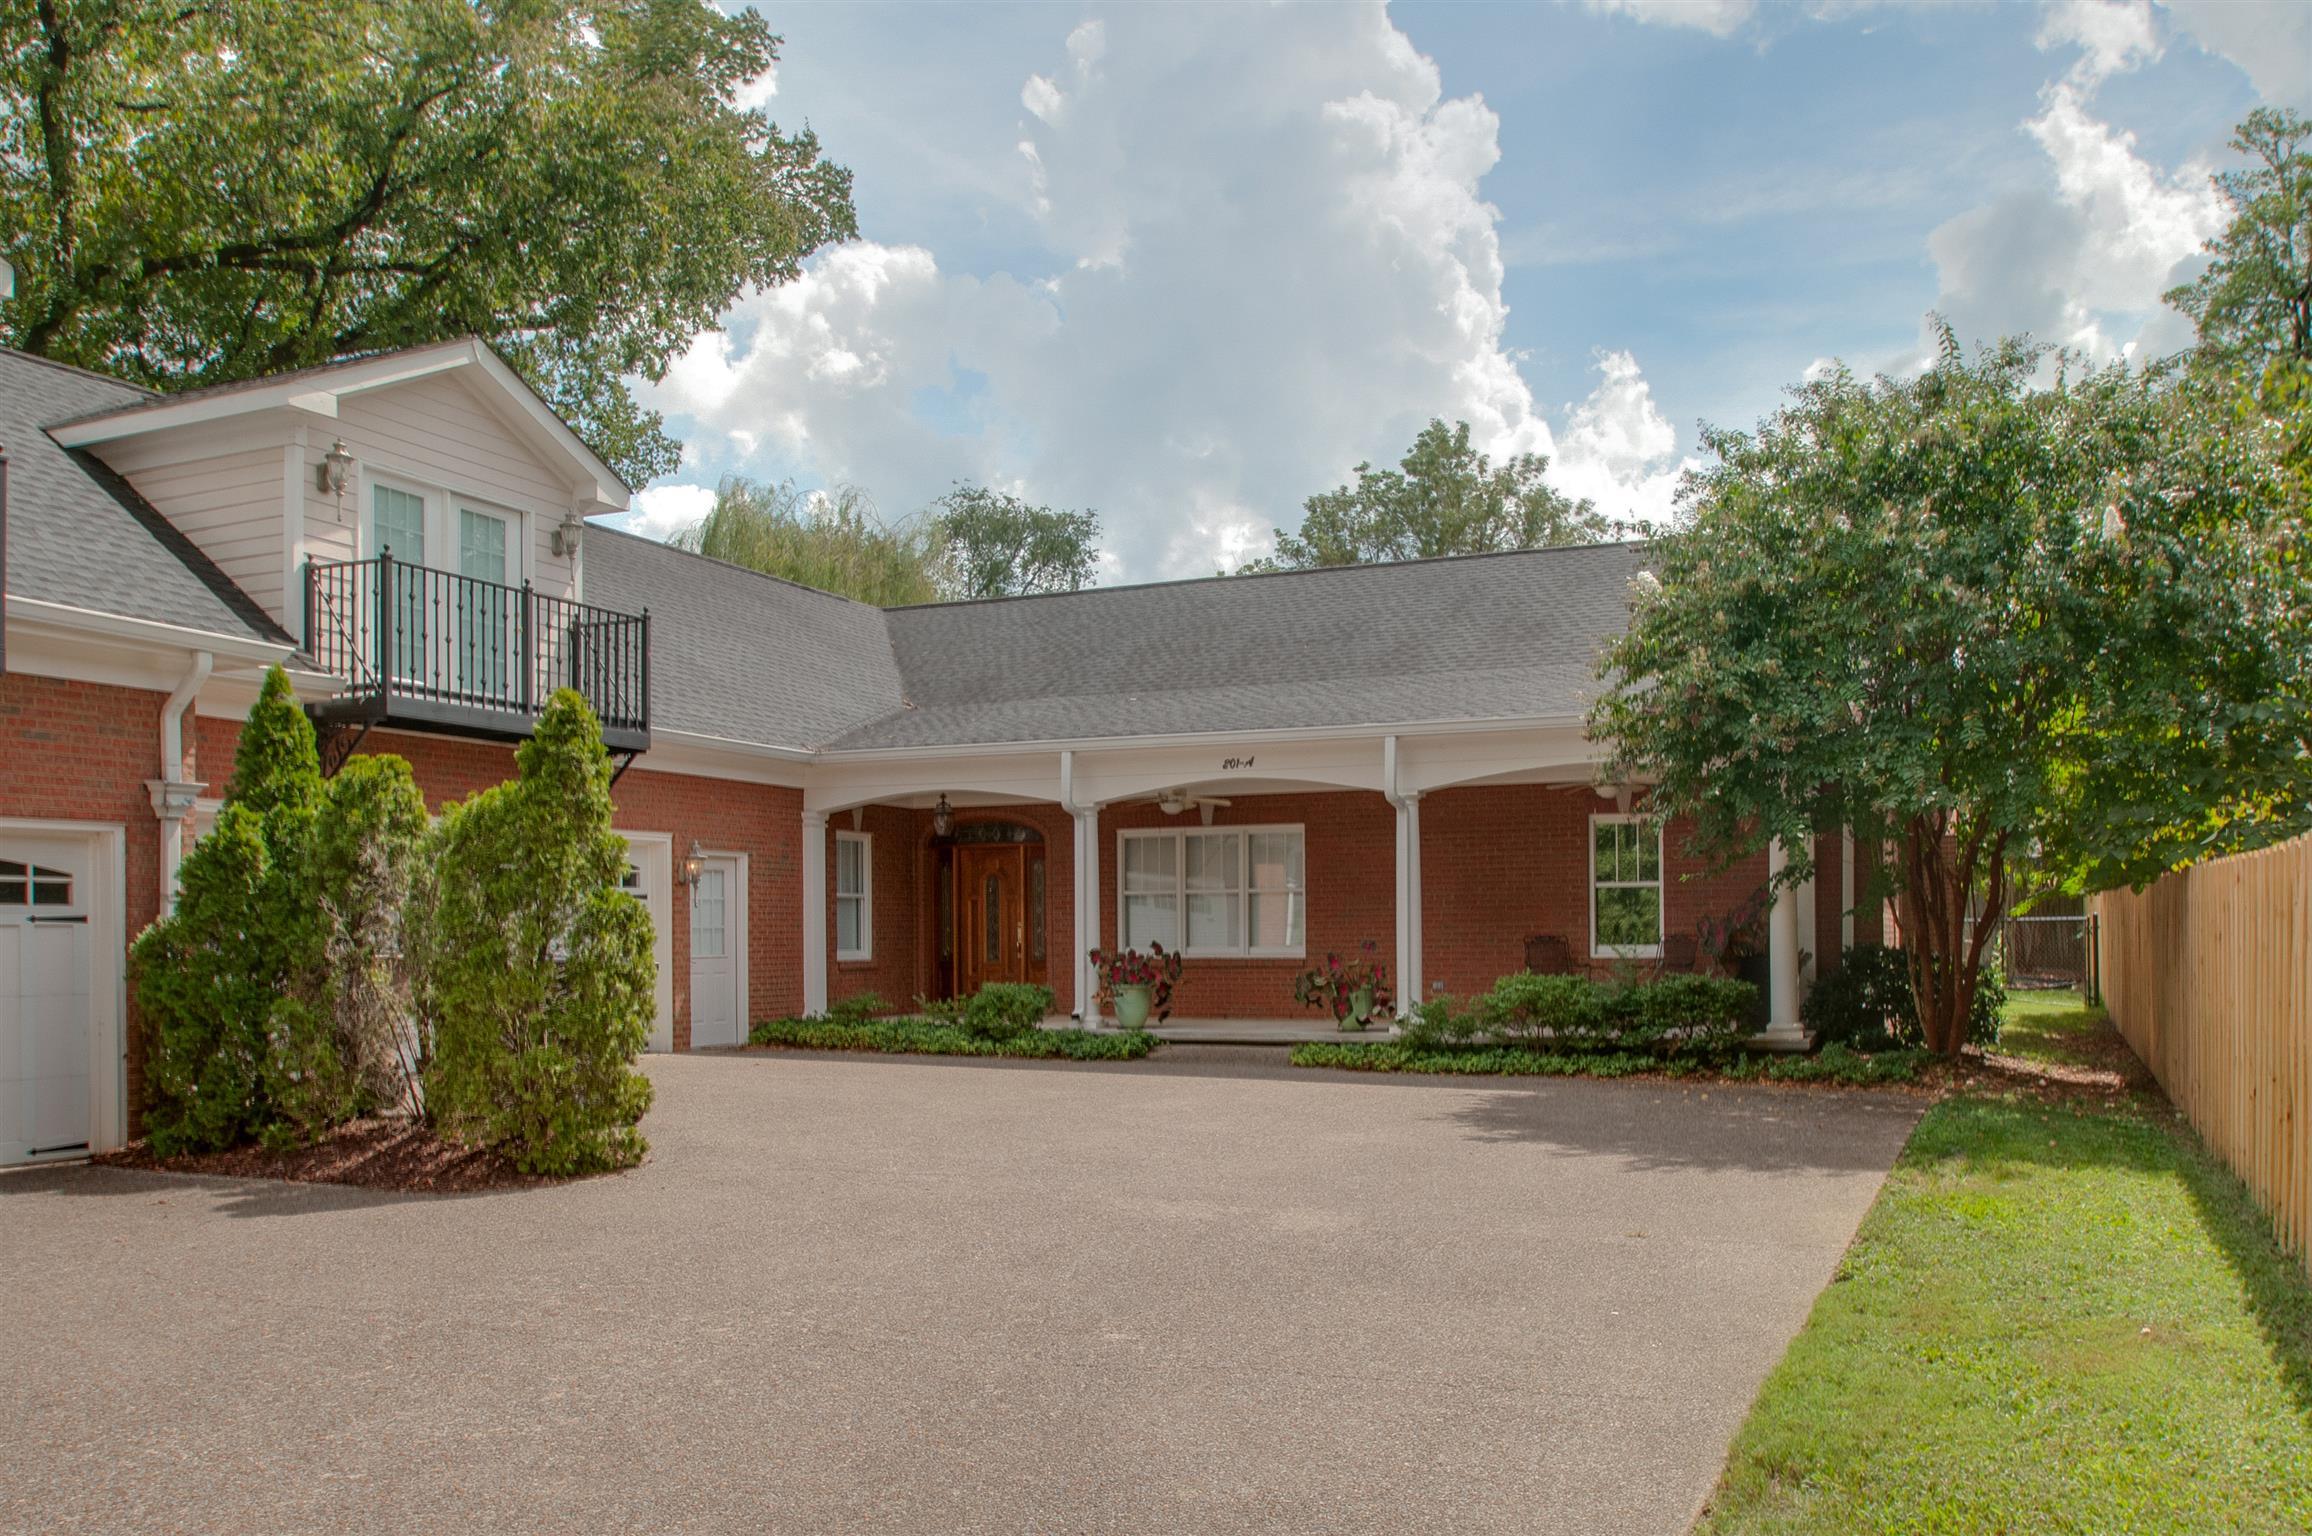 201 Woodmont Circle, Nashville, TN 37205